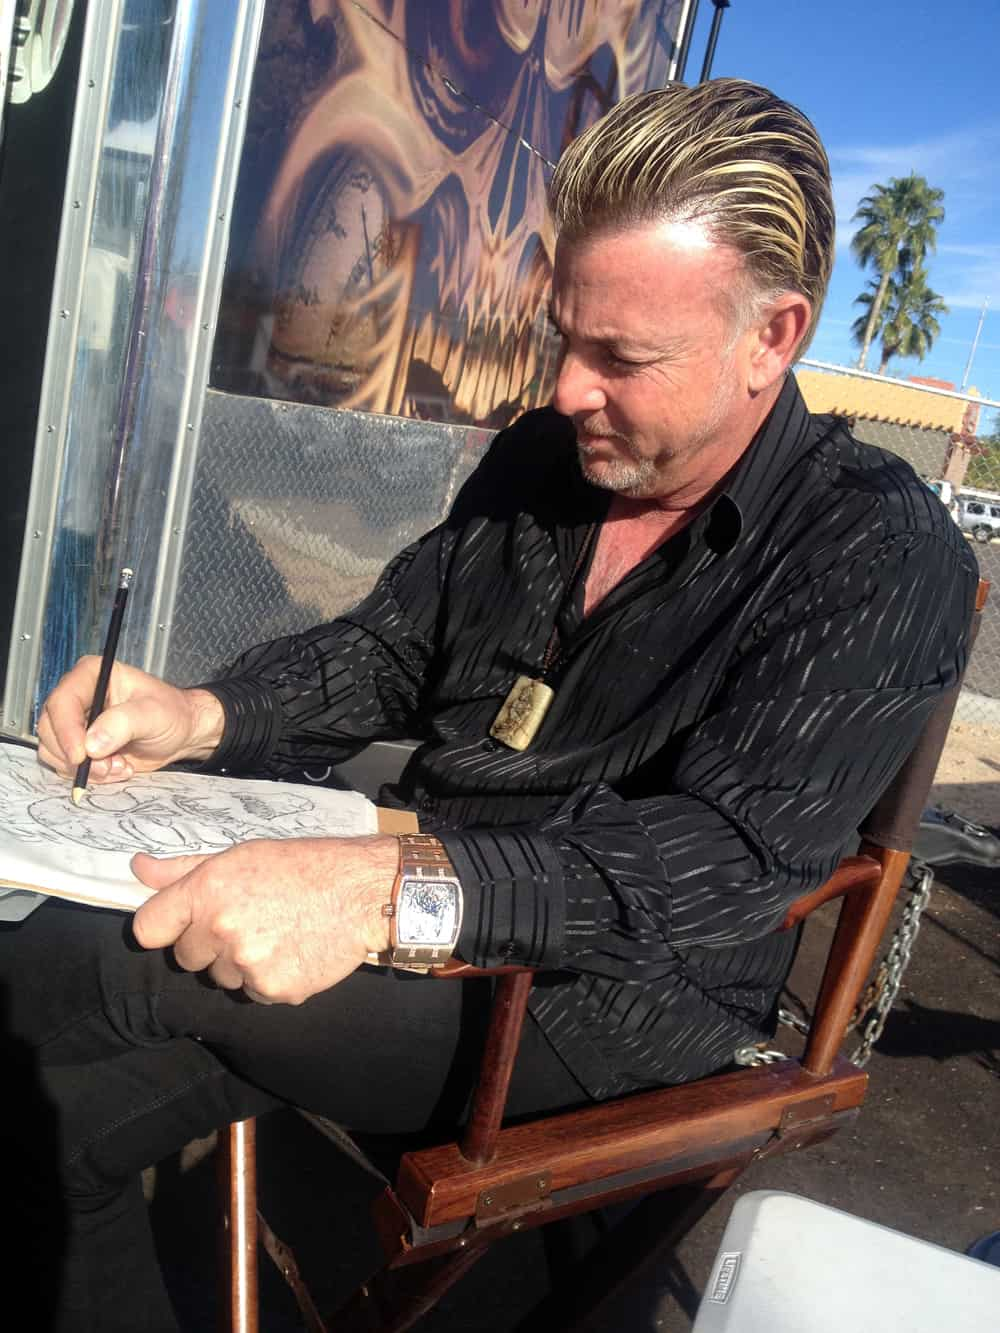 Steve Soffa Drawing at AZ Bike Week 2014, Cave Creek, AZ